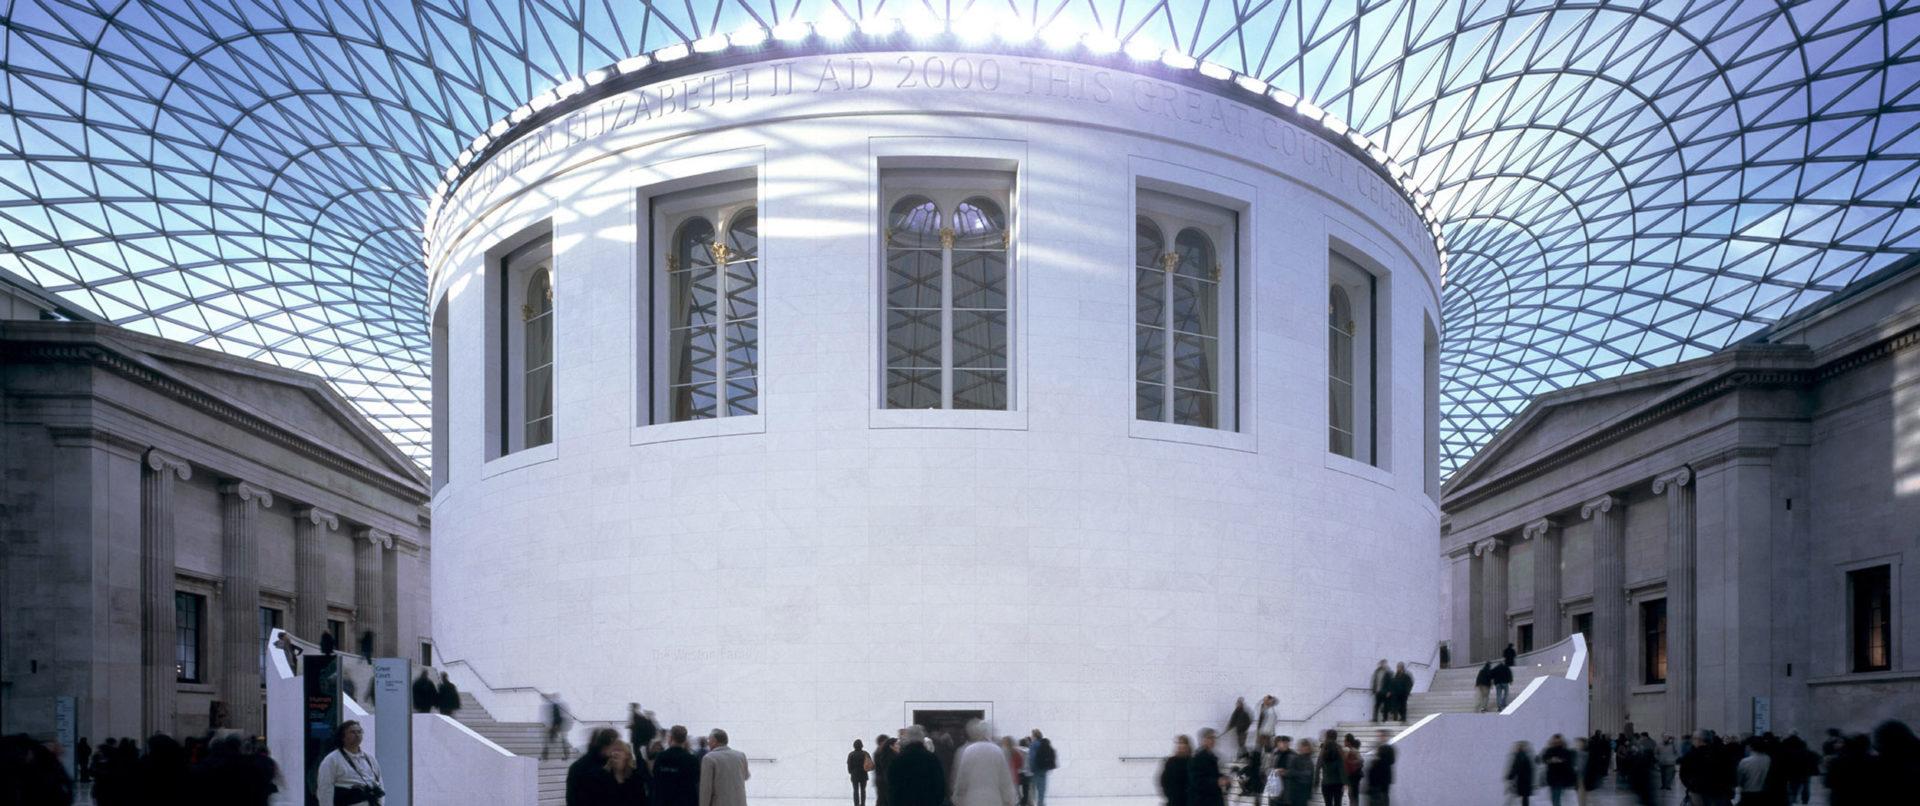 british-museum-kids-tour-treasure-hunt